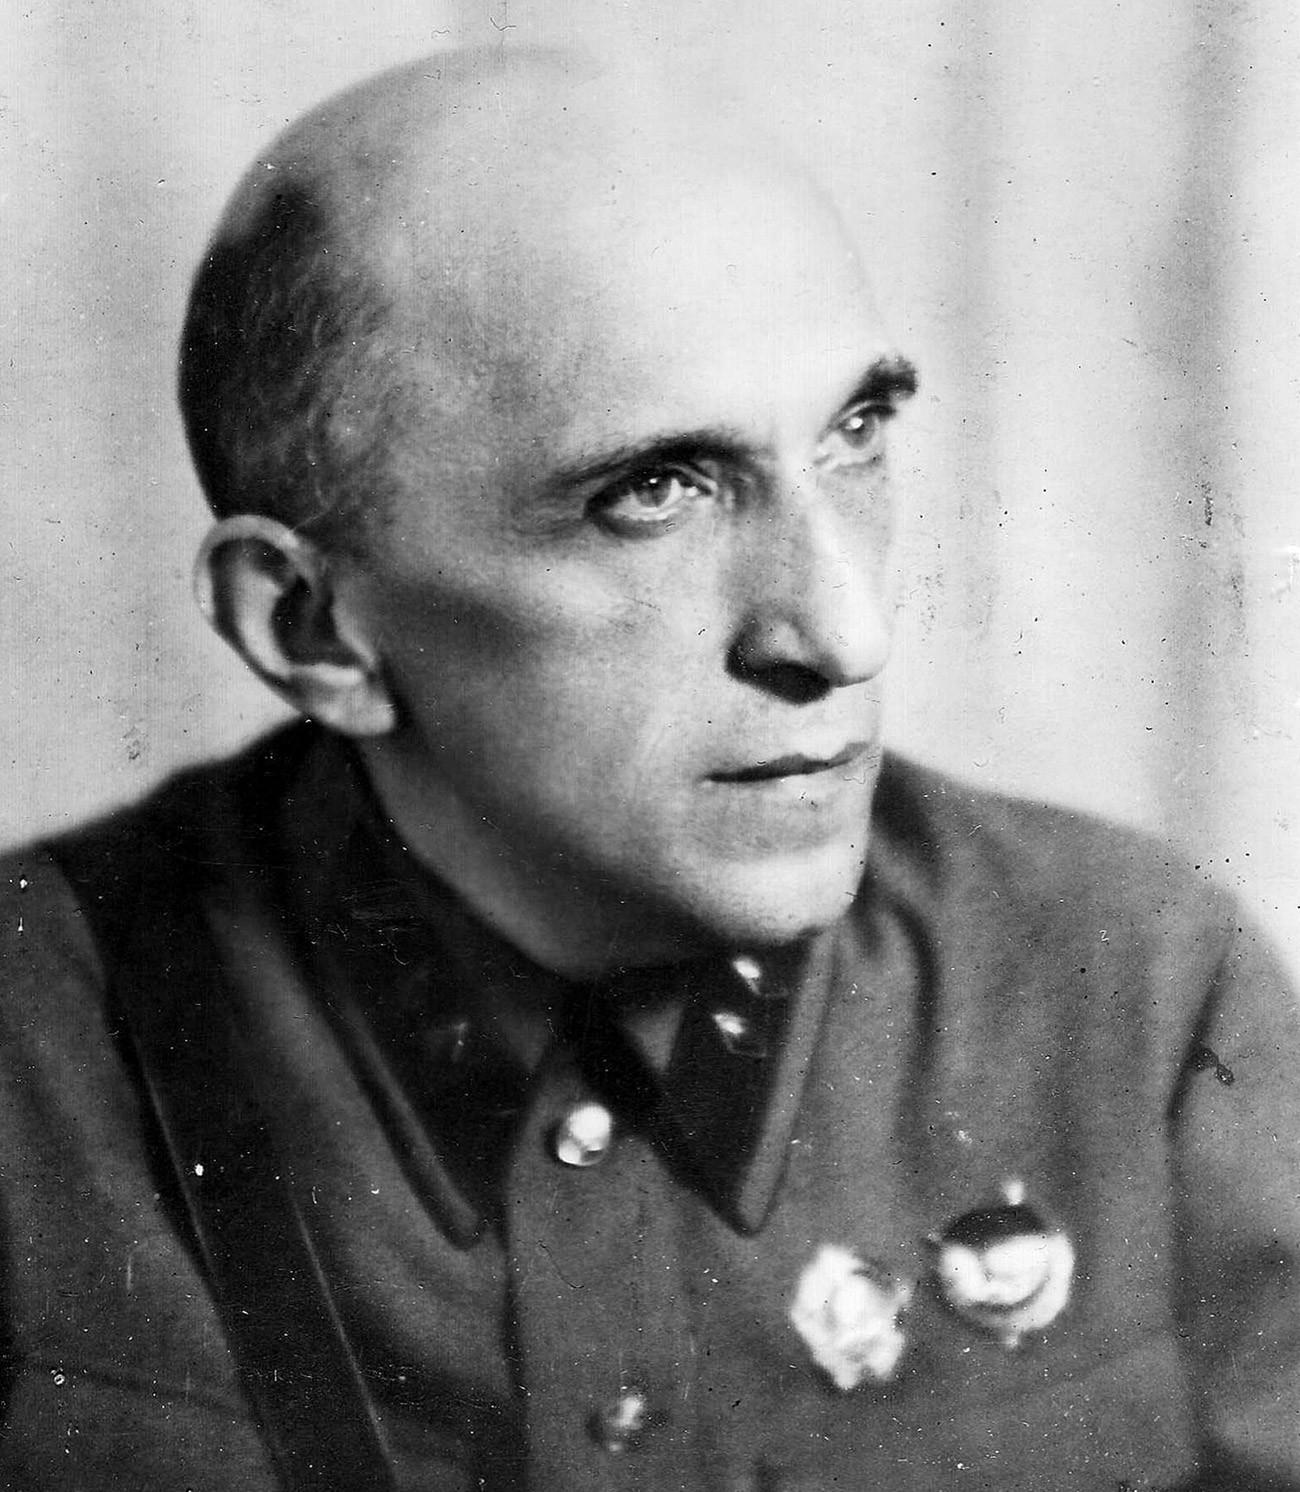 Iakov Serebrianski en 1941